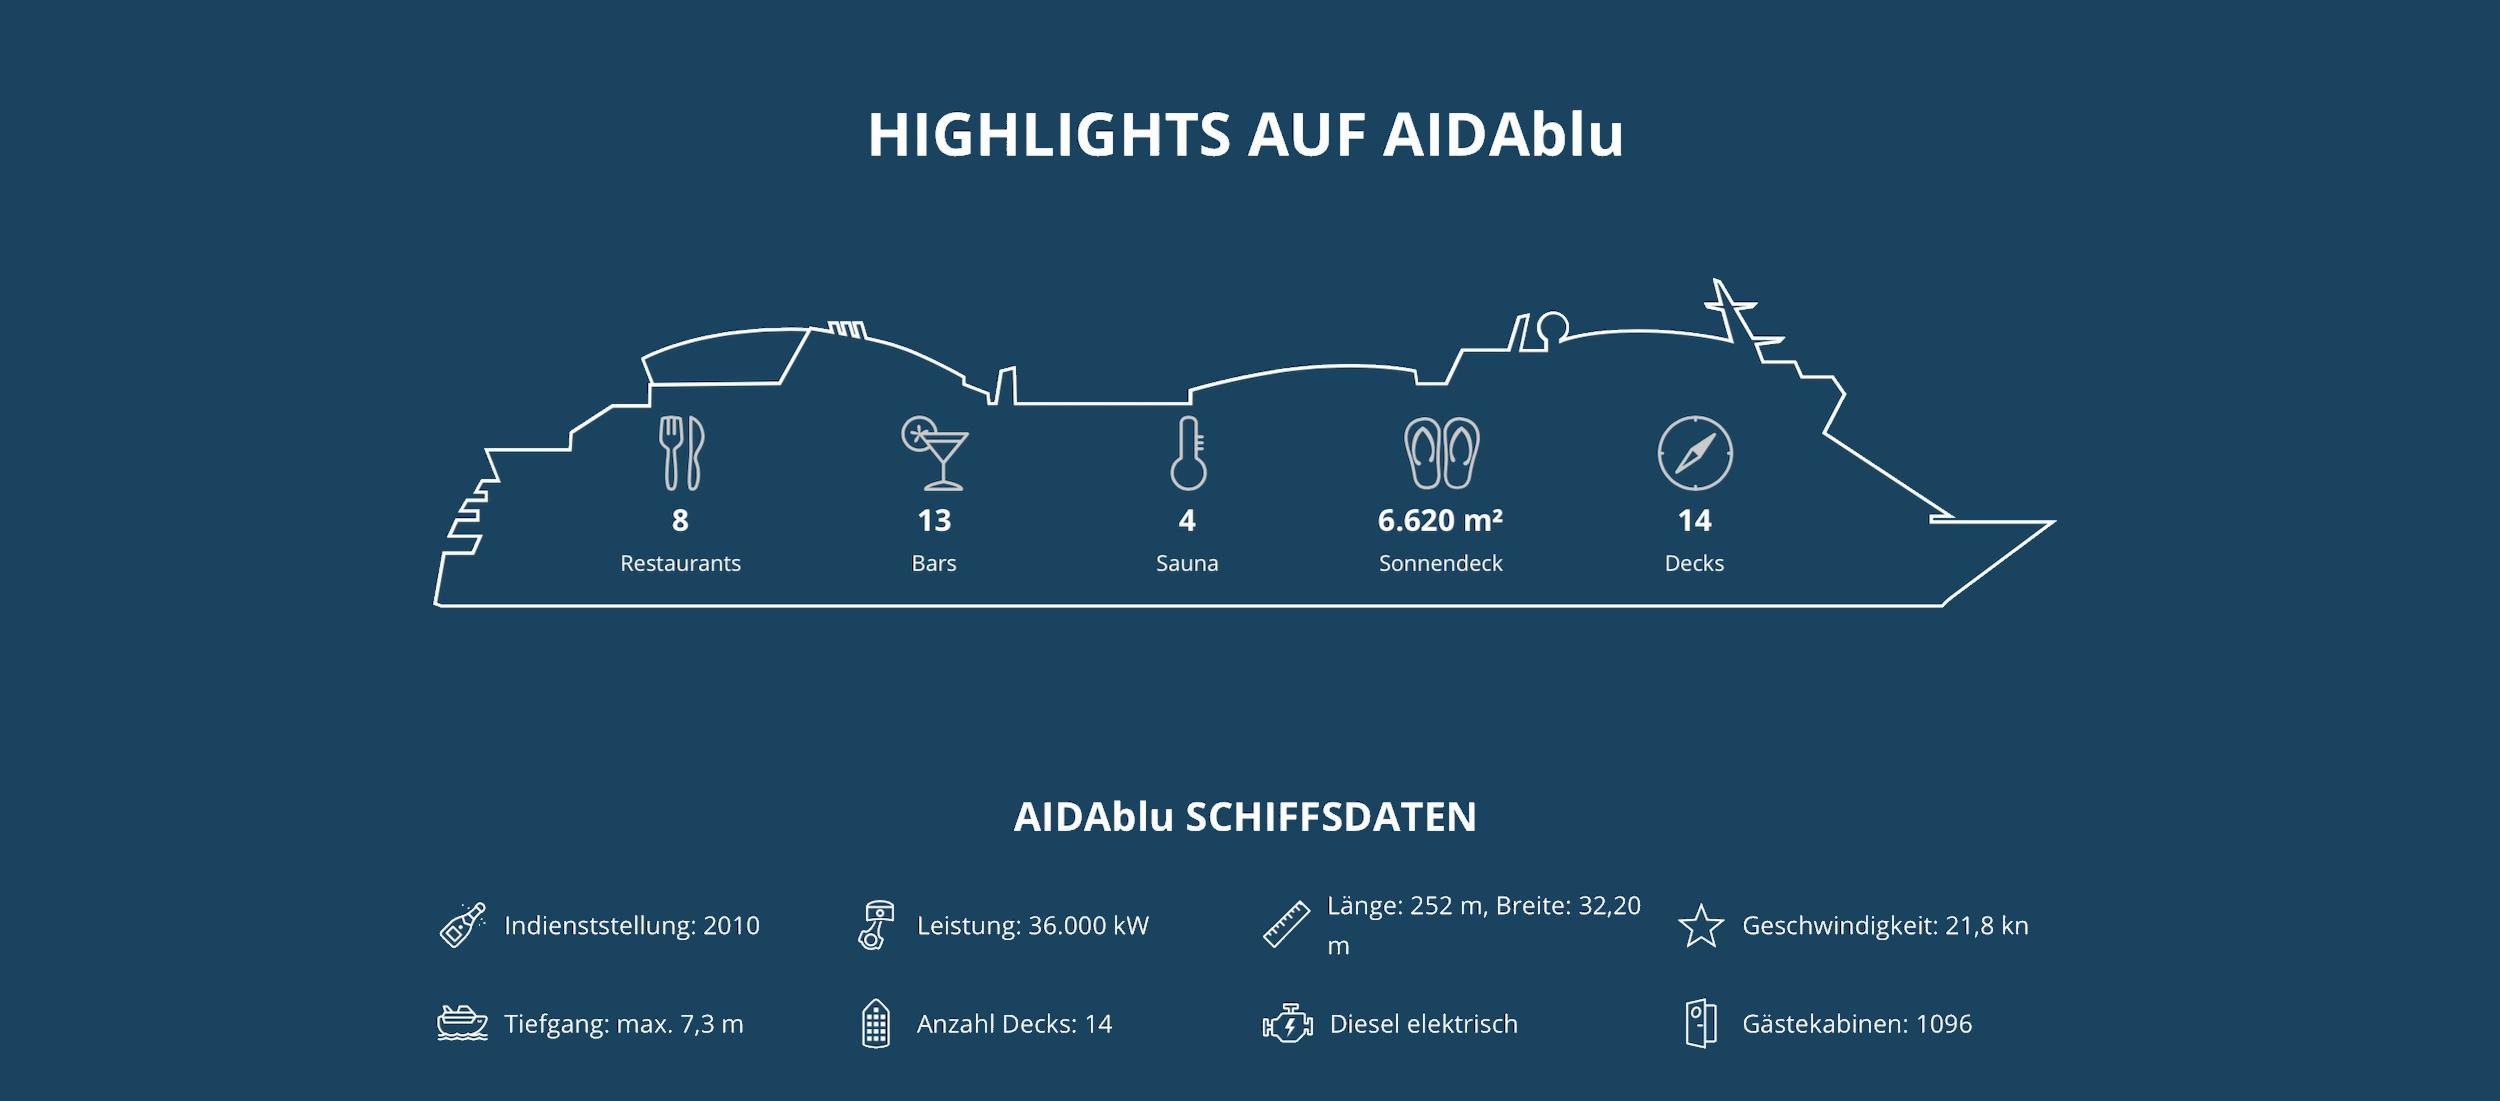 aida-cruises-ships-aidablu-daten